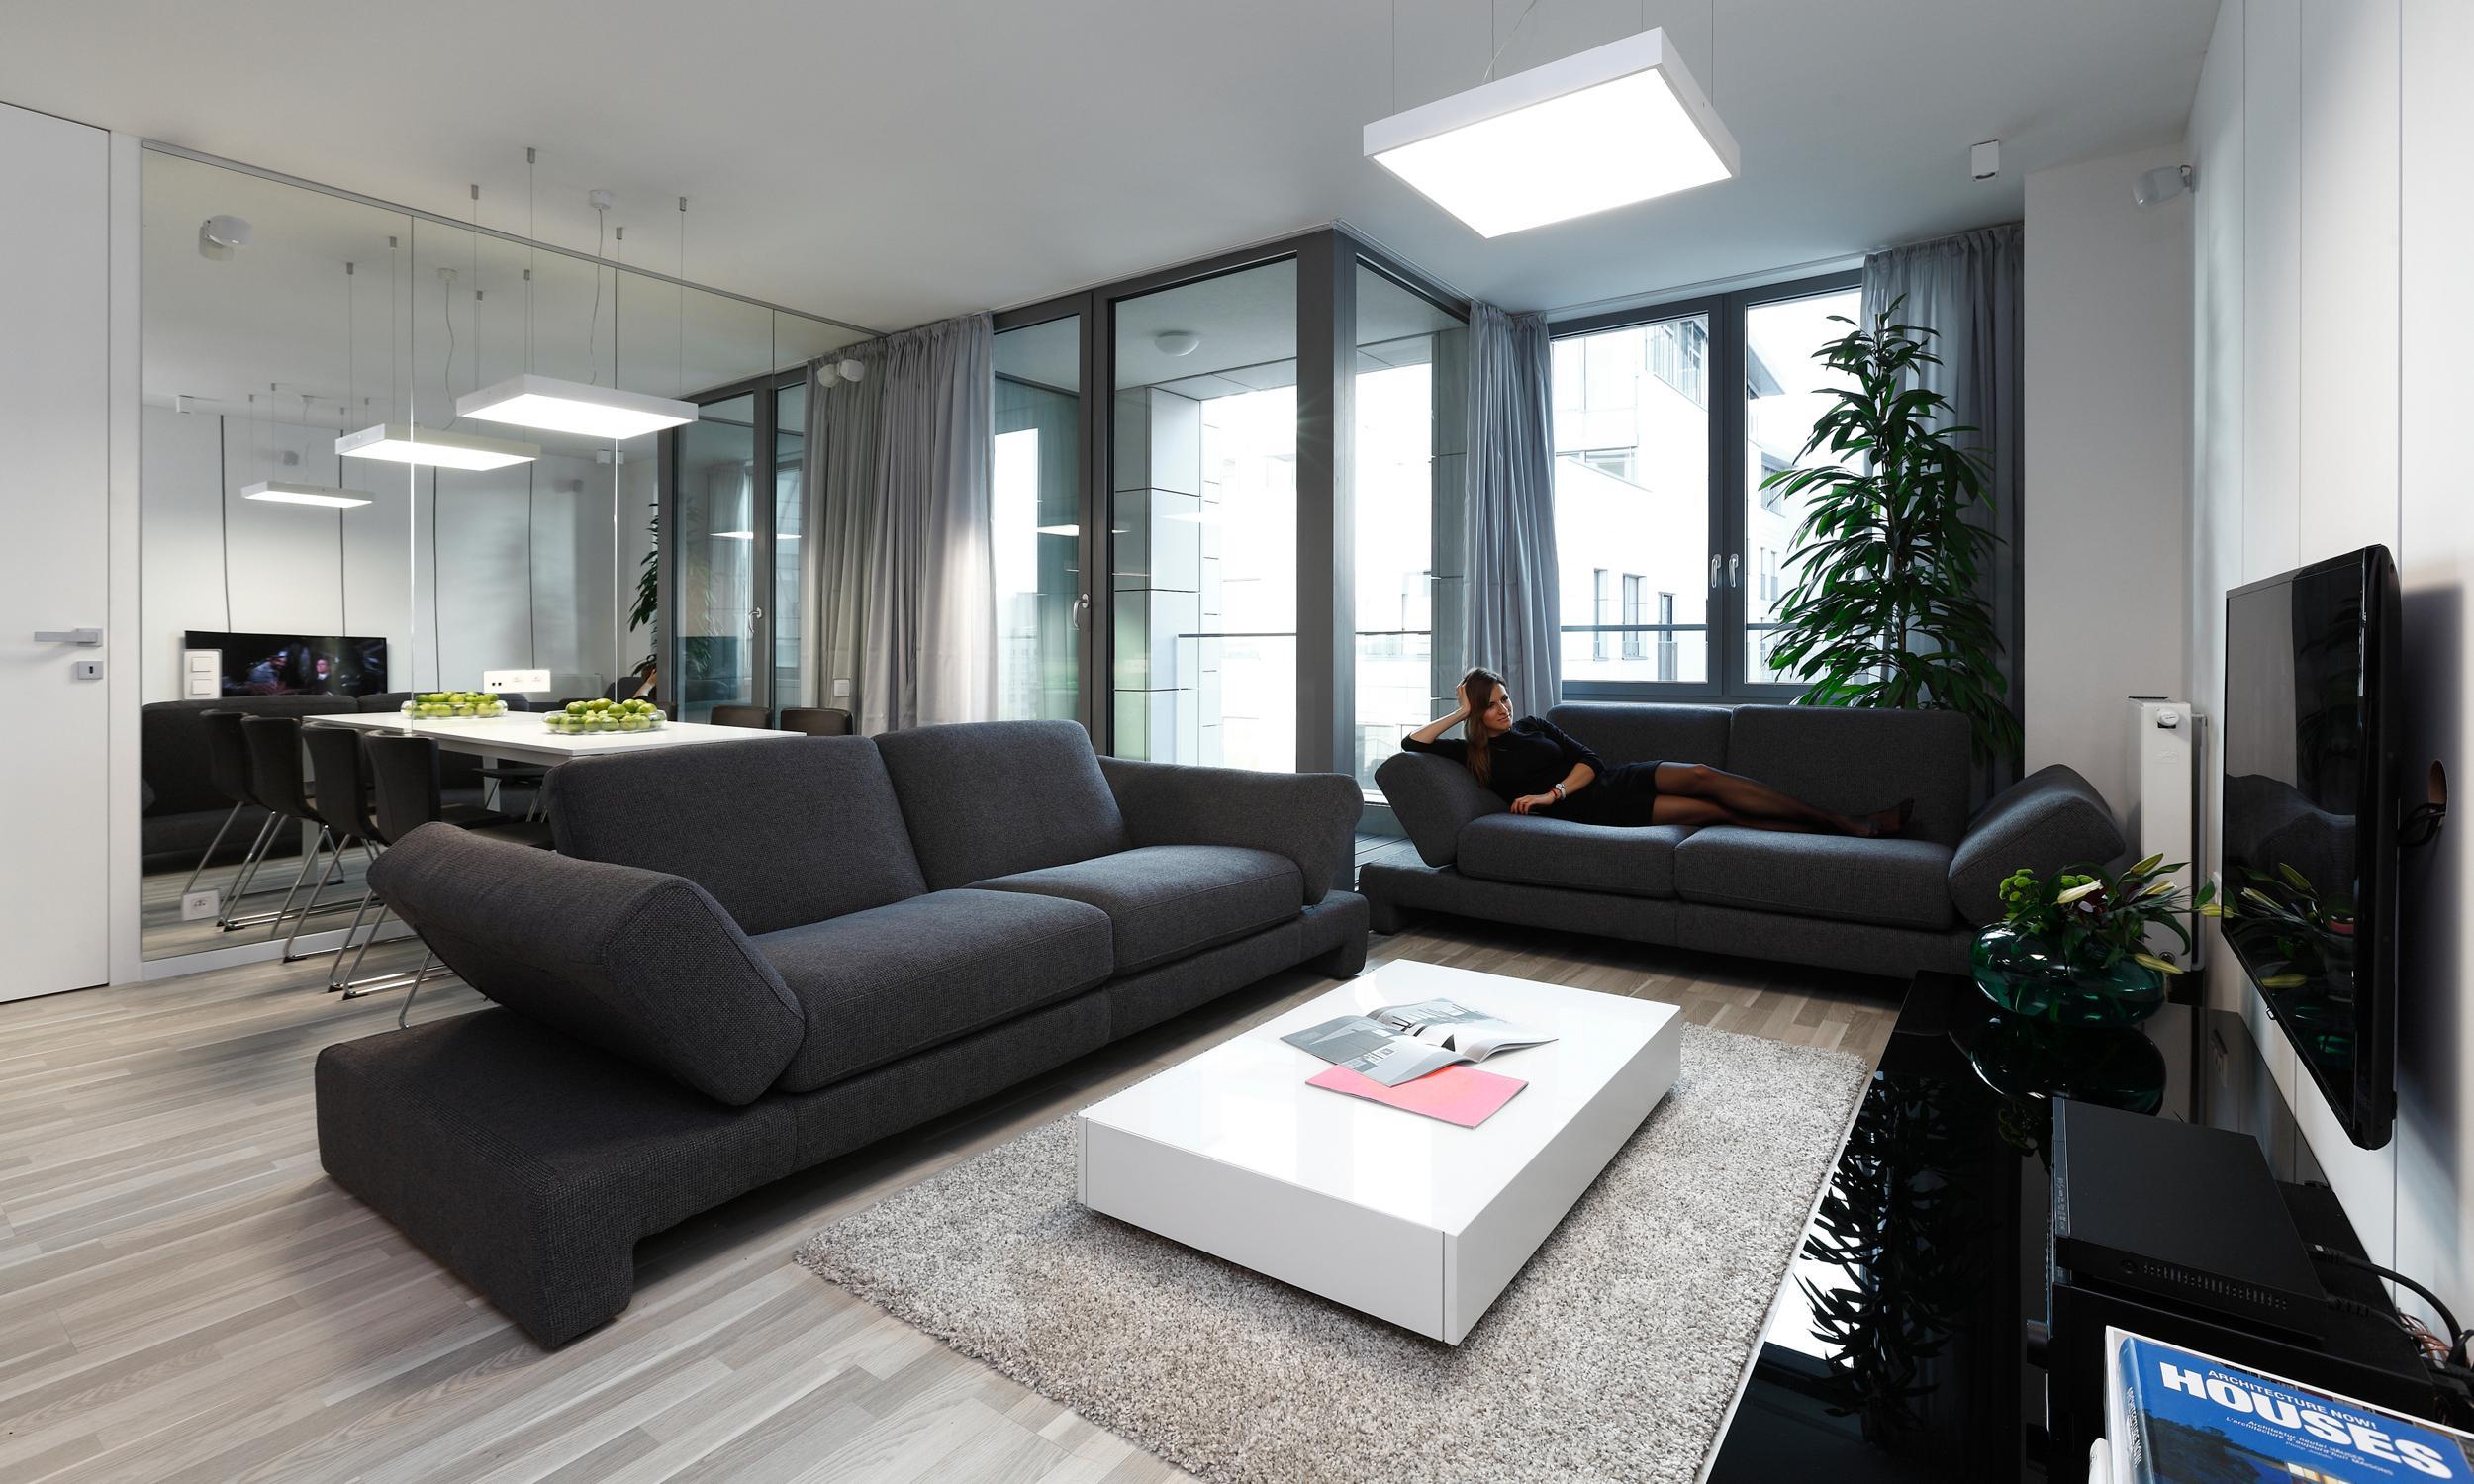 apartment mit zwei wohneinheiten, bratislava, slowakei   rules